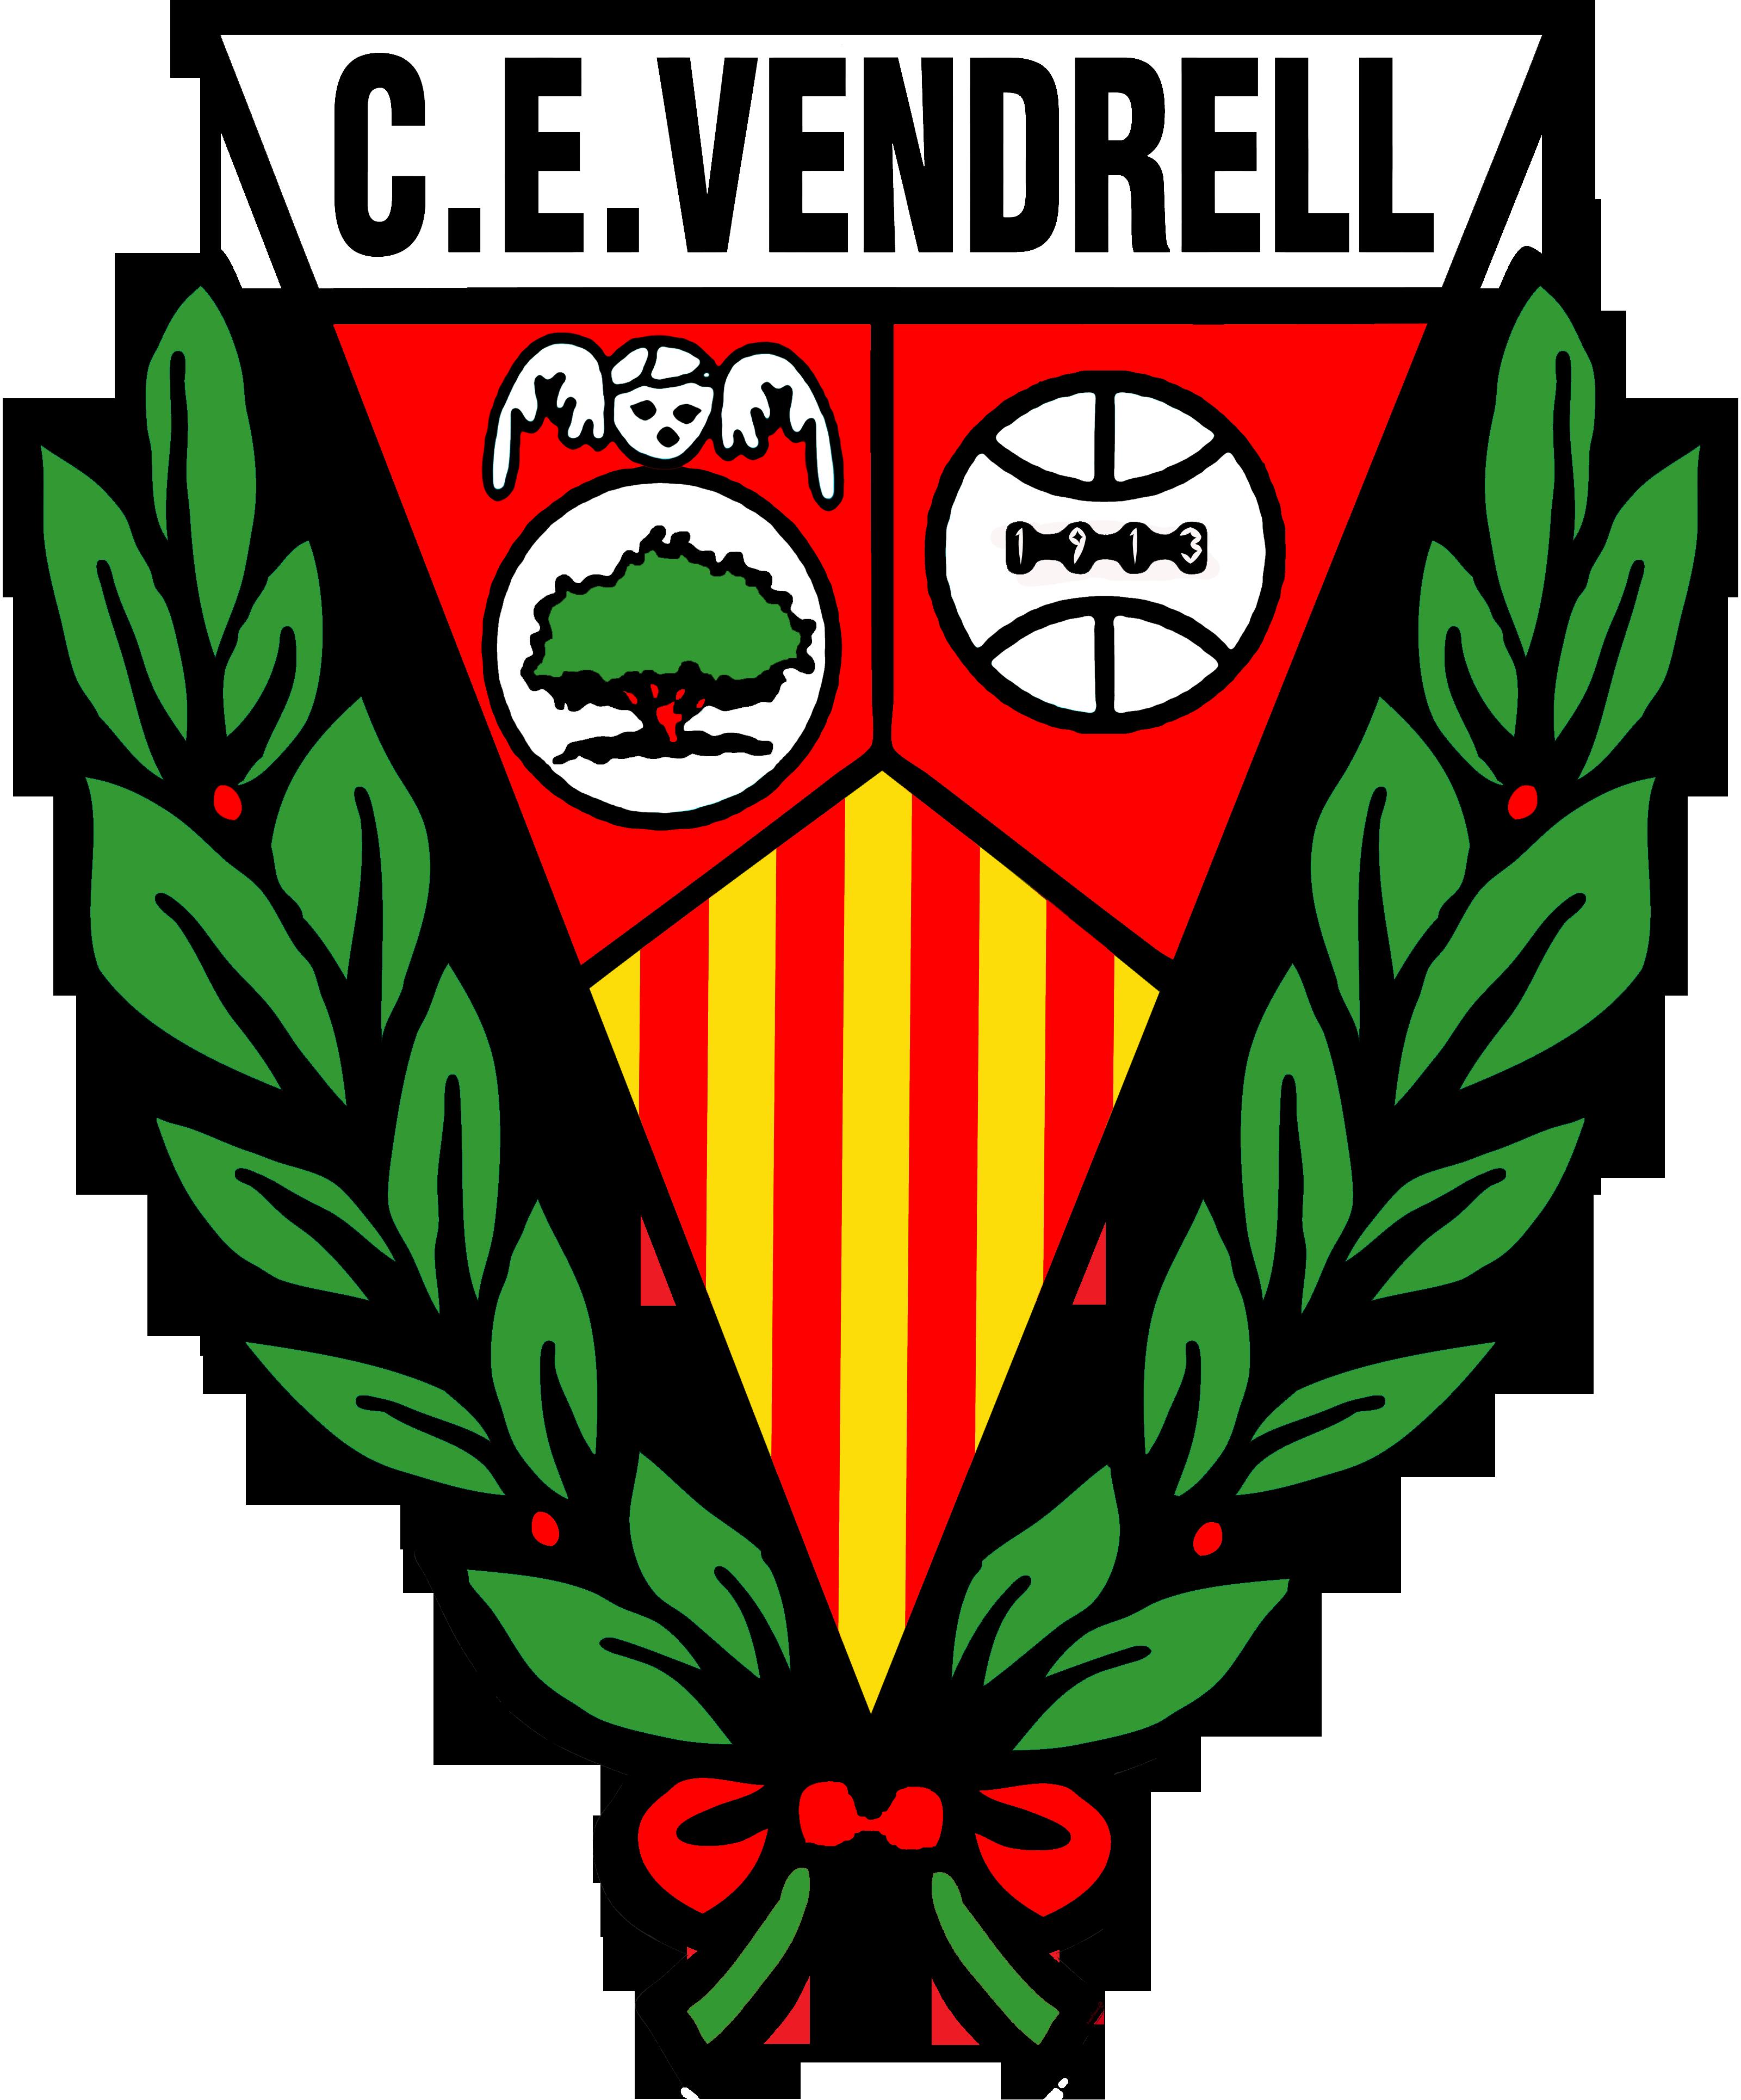 C.E. Vendrell Infantil A